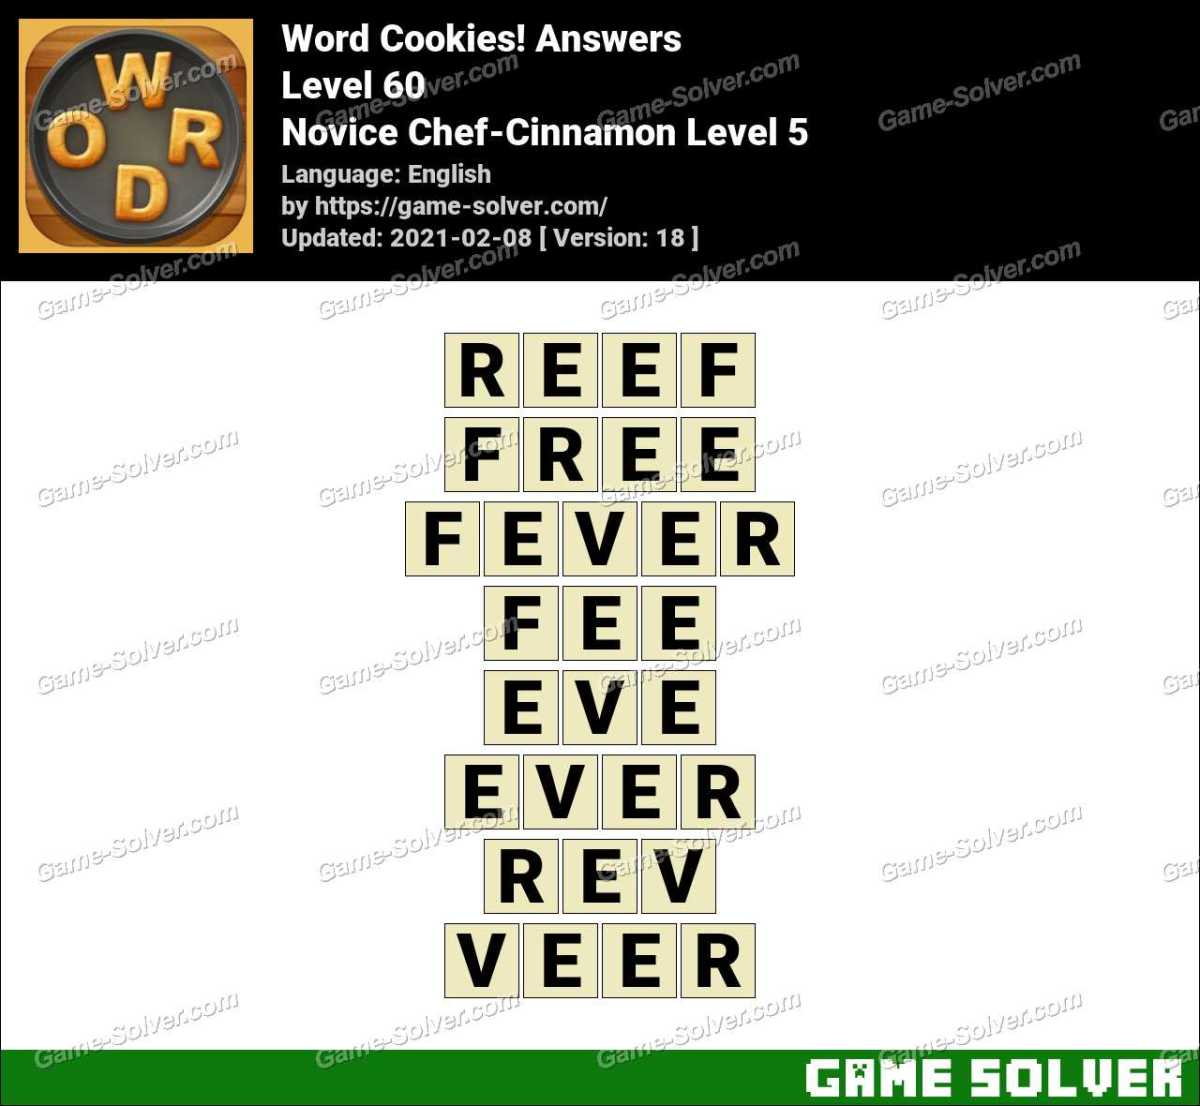 Word Cookies Novice Chef-Cinnamon Level 5 Answers